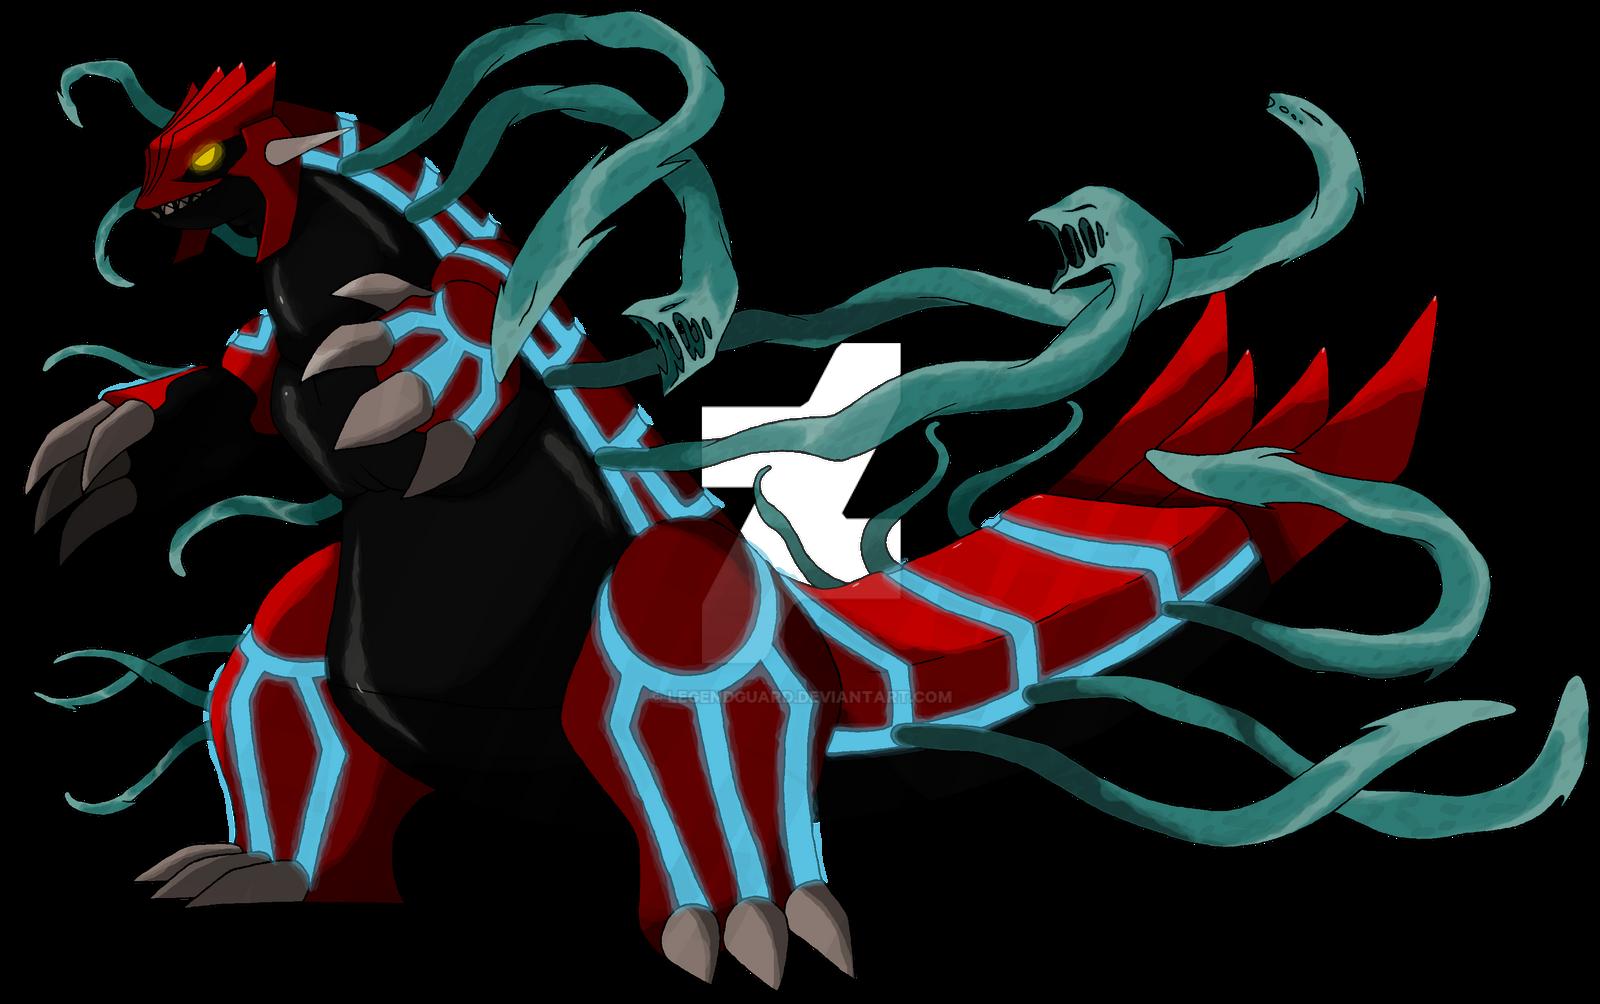 Groudon Virus Form v1 [Being remade] by legendguard on DeviantArt